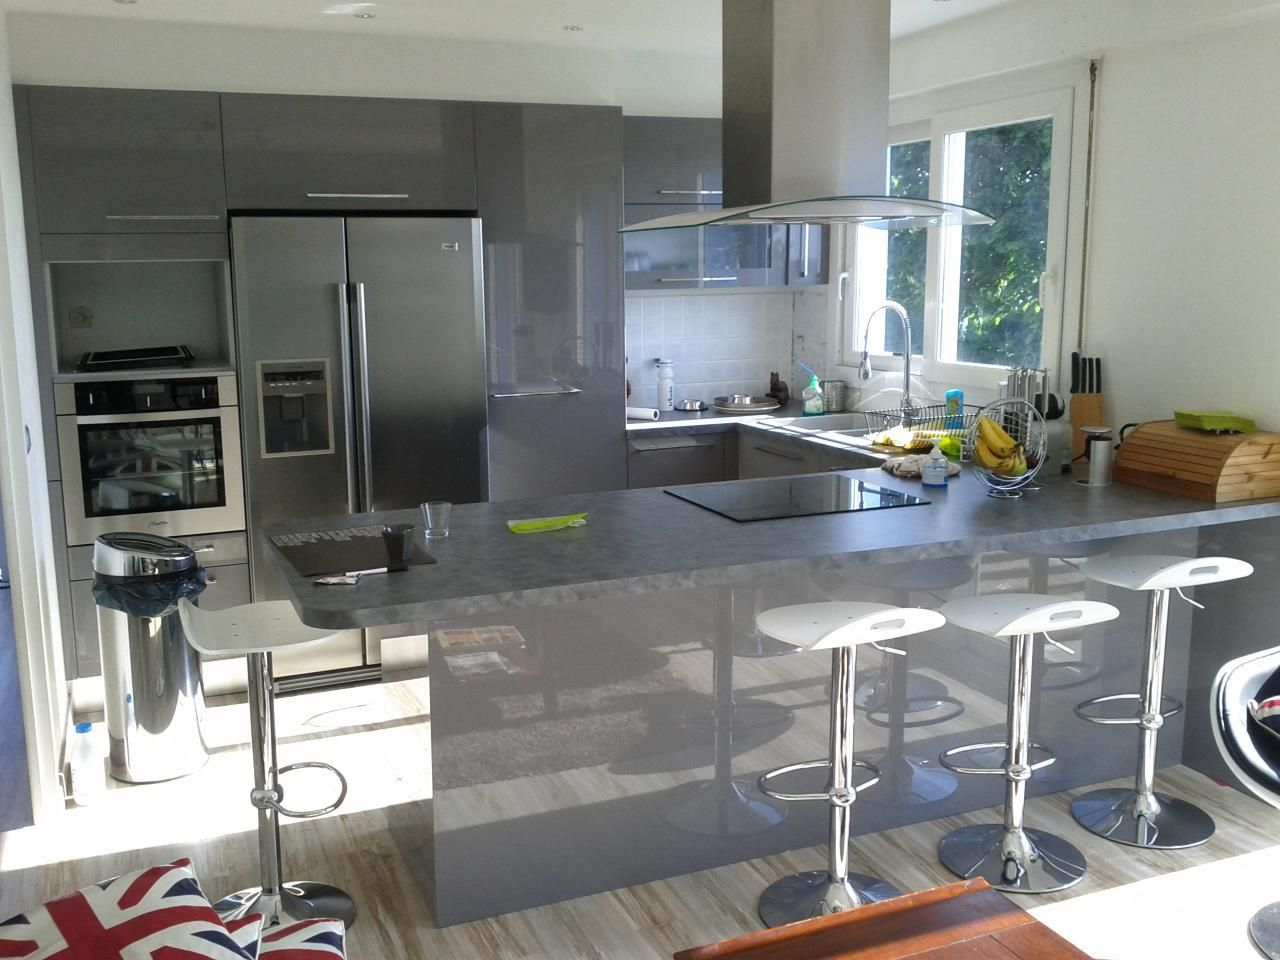 cuisine laquée gris brillant | Cuisine | Pinterest | Cuisine